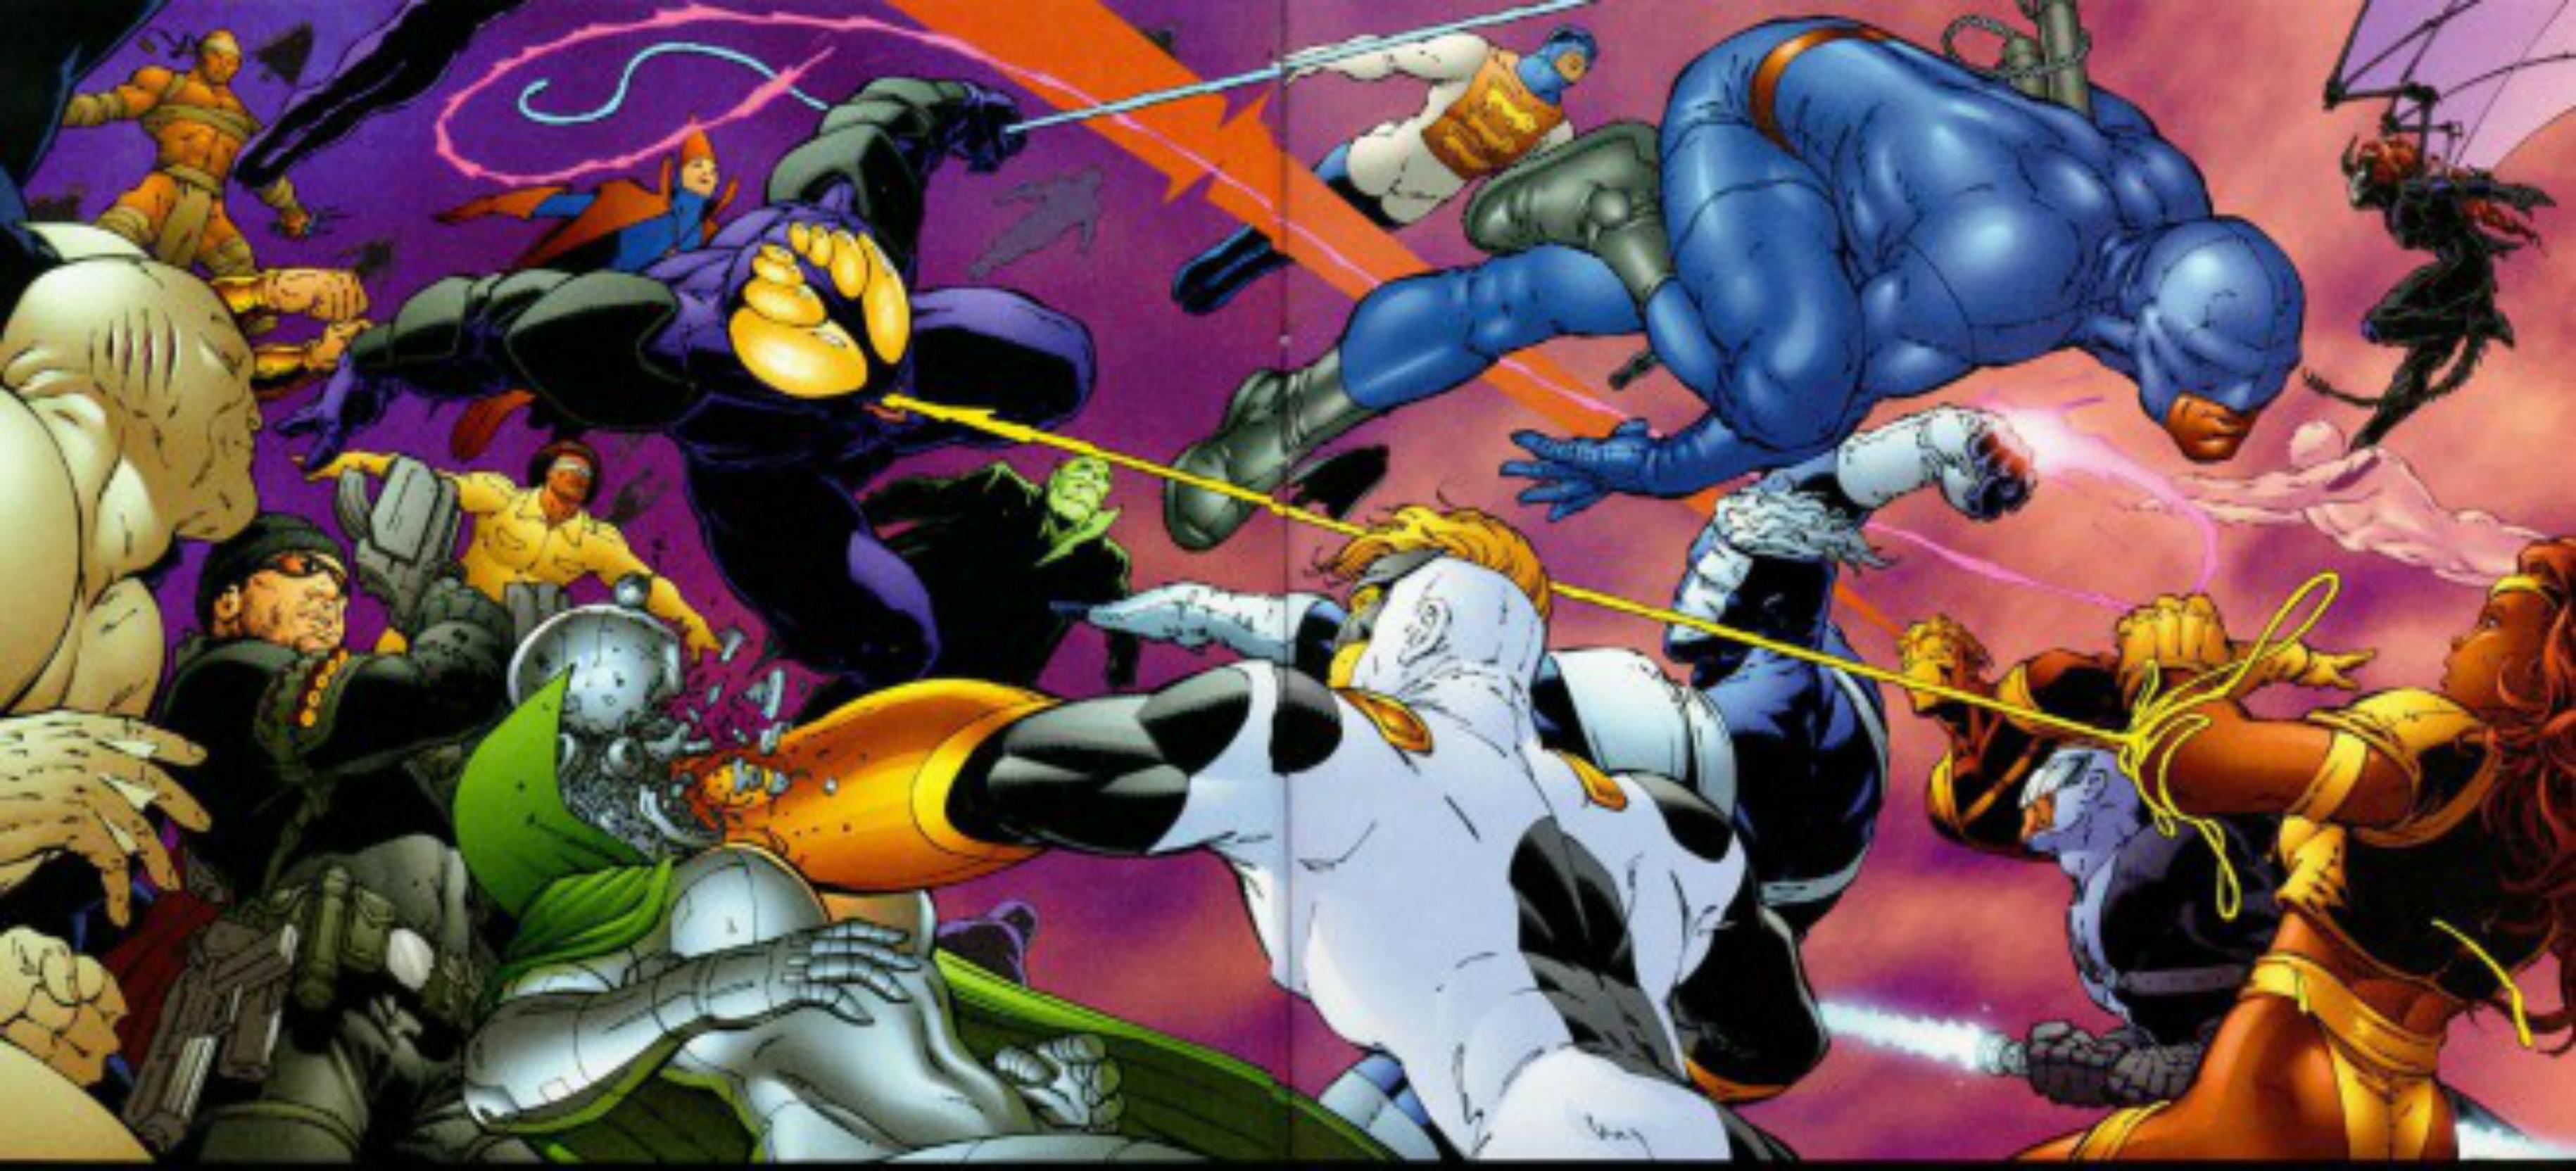 [Multivers Crisis] La Fin de Tout [Justice League] 908417TheAuthorityVol116pagesJackKirbyanalogue660x513